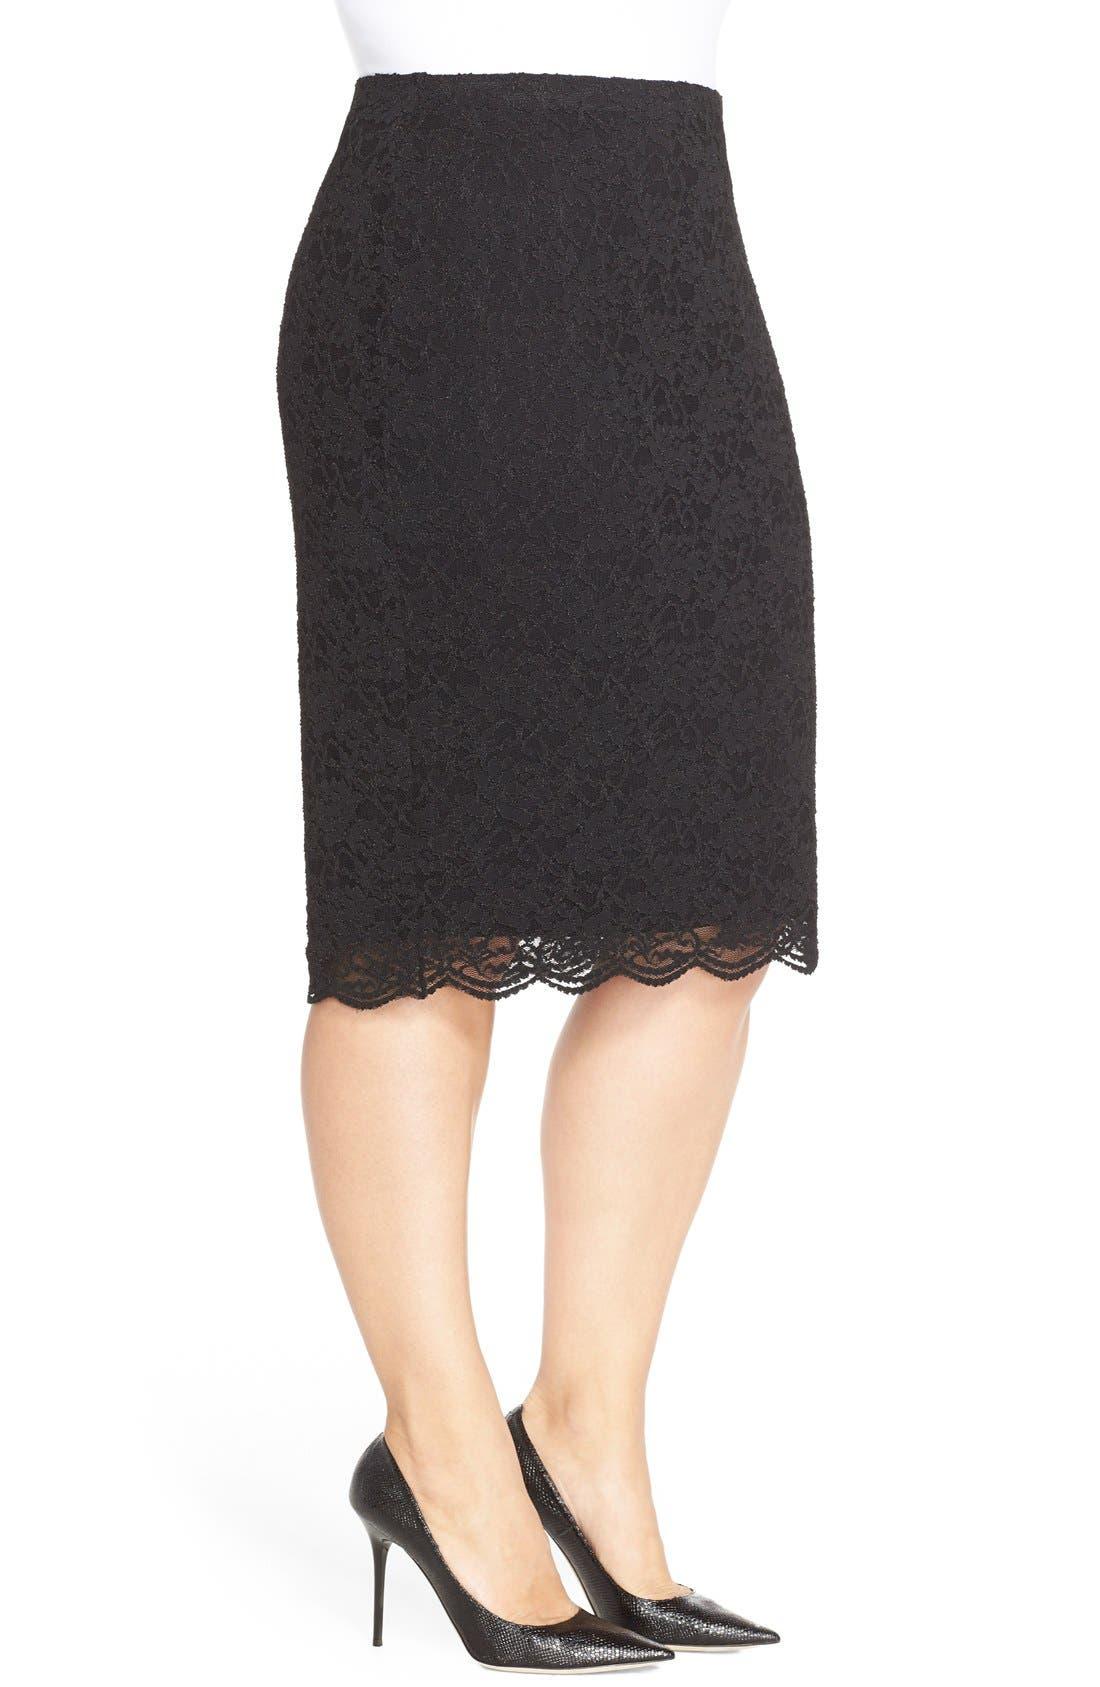 Alternate Image 3  - Vince Camuto Stretch Lace Pencil Skirt (Plus Size)